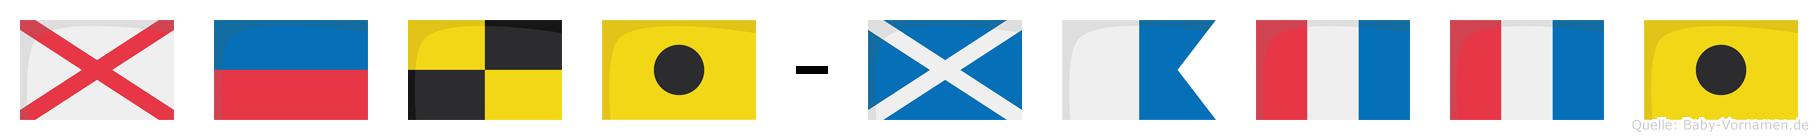 Veli-Matti im Flaggenalphabet